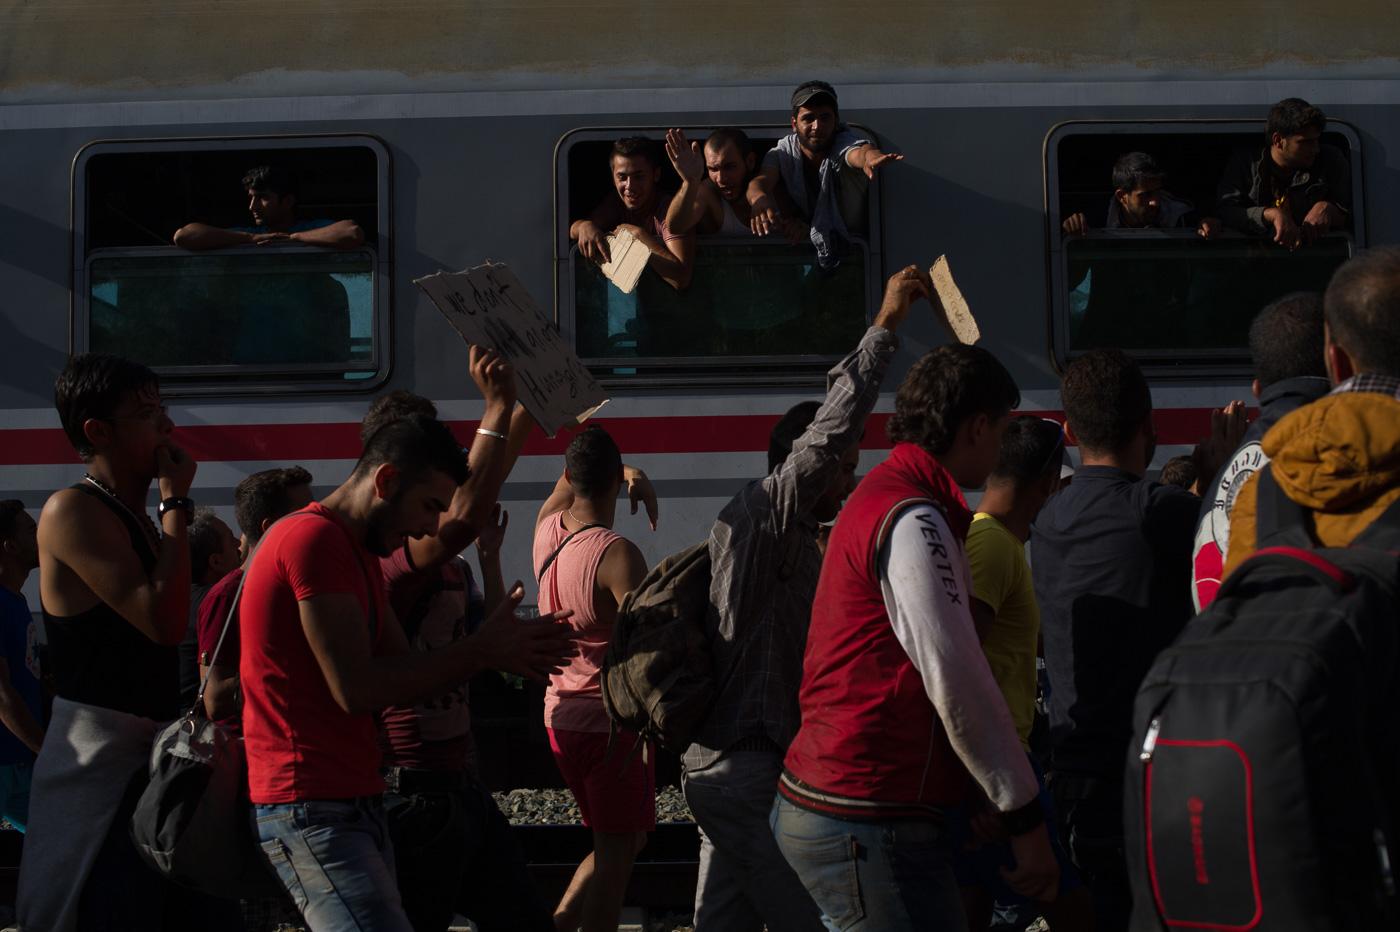 15_PEM_SRB_Refugees_0391.jpg